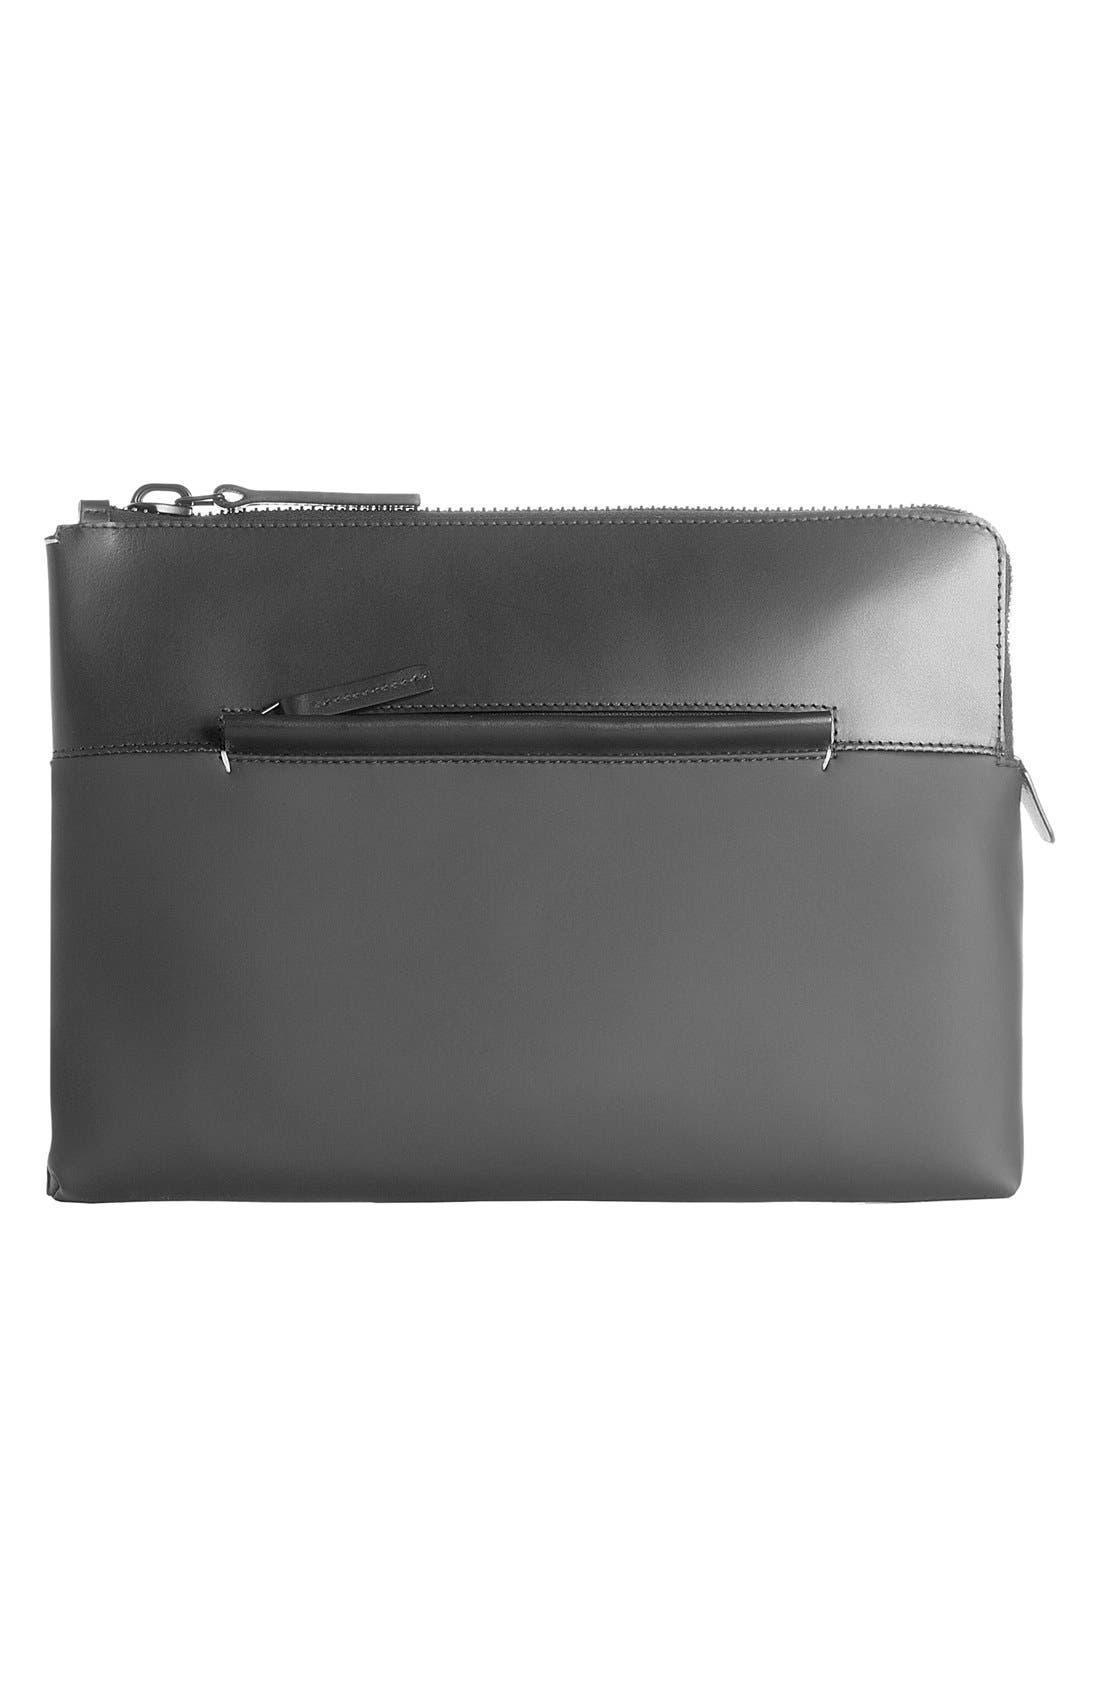 Main Image - Troubadour Rubber & Leather Portfolio Case